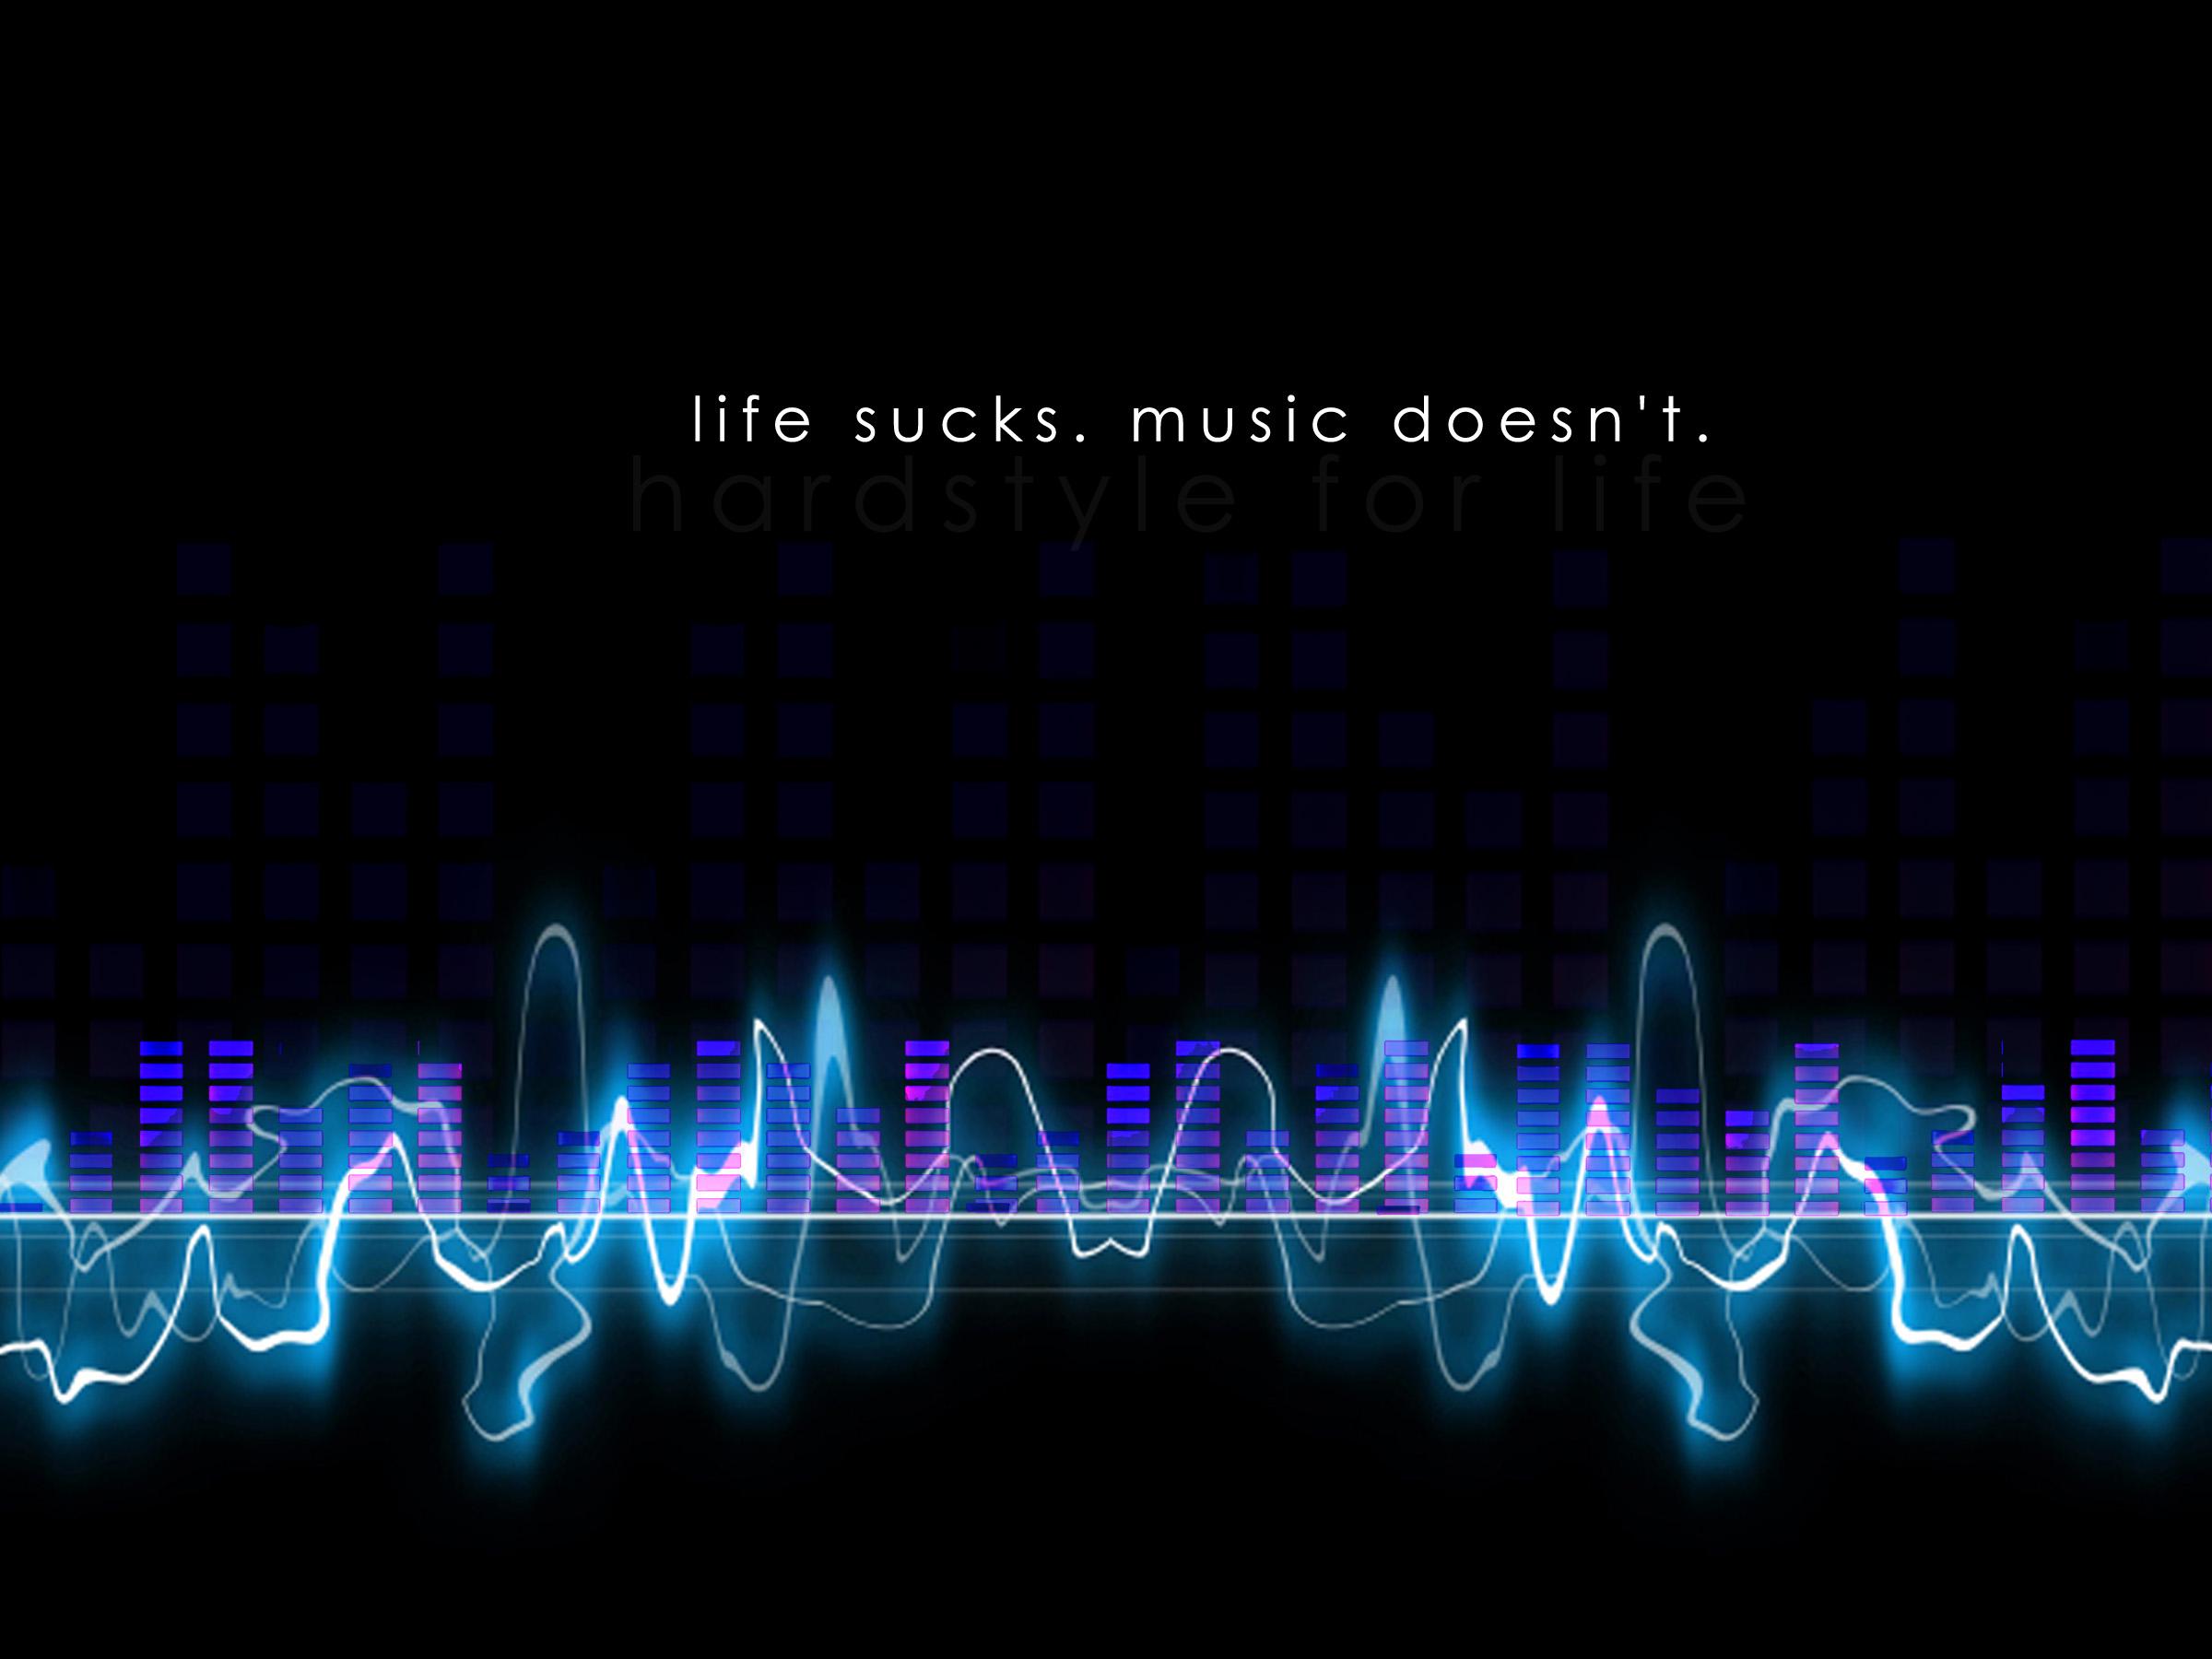 fs41f2009005d5Life Sucks  Music Doesnt  by AustinE31891jpg 2400x1800